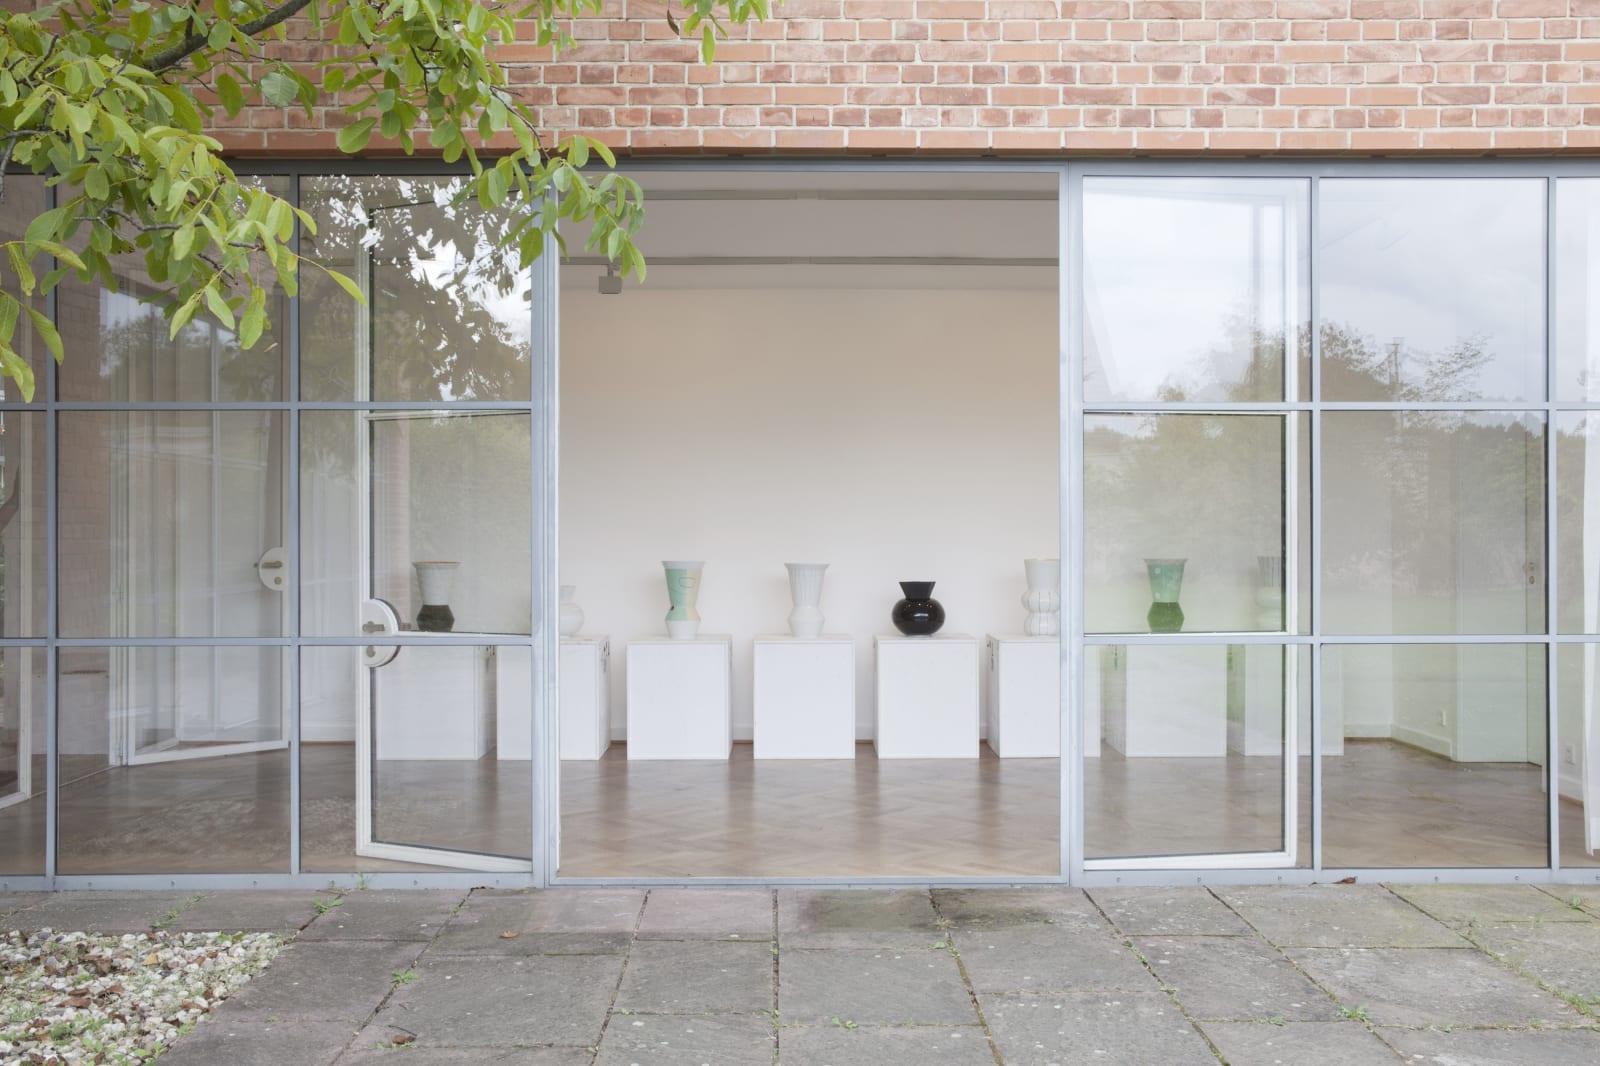 Installation view, Lemke, Mies van der Rohe Haus, Berlin (2011)   Photo: Benedikt Partenheimer